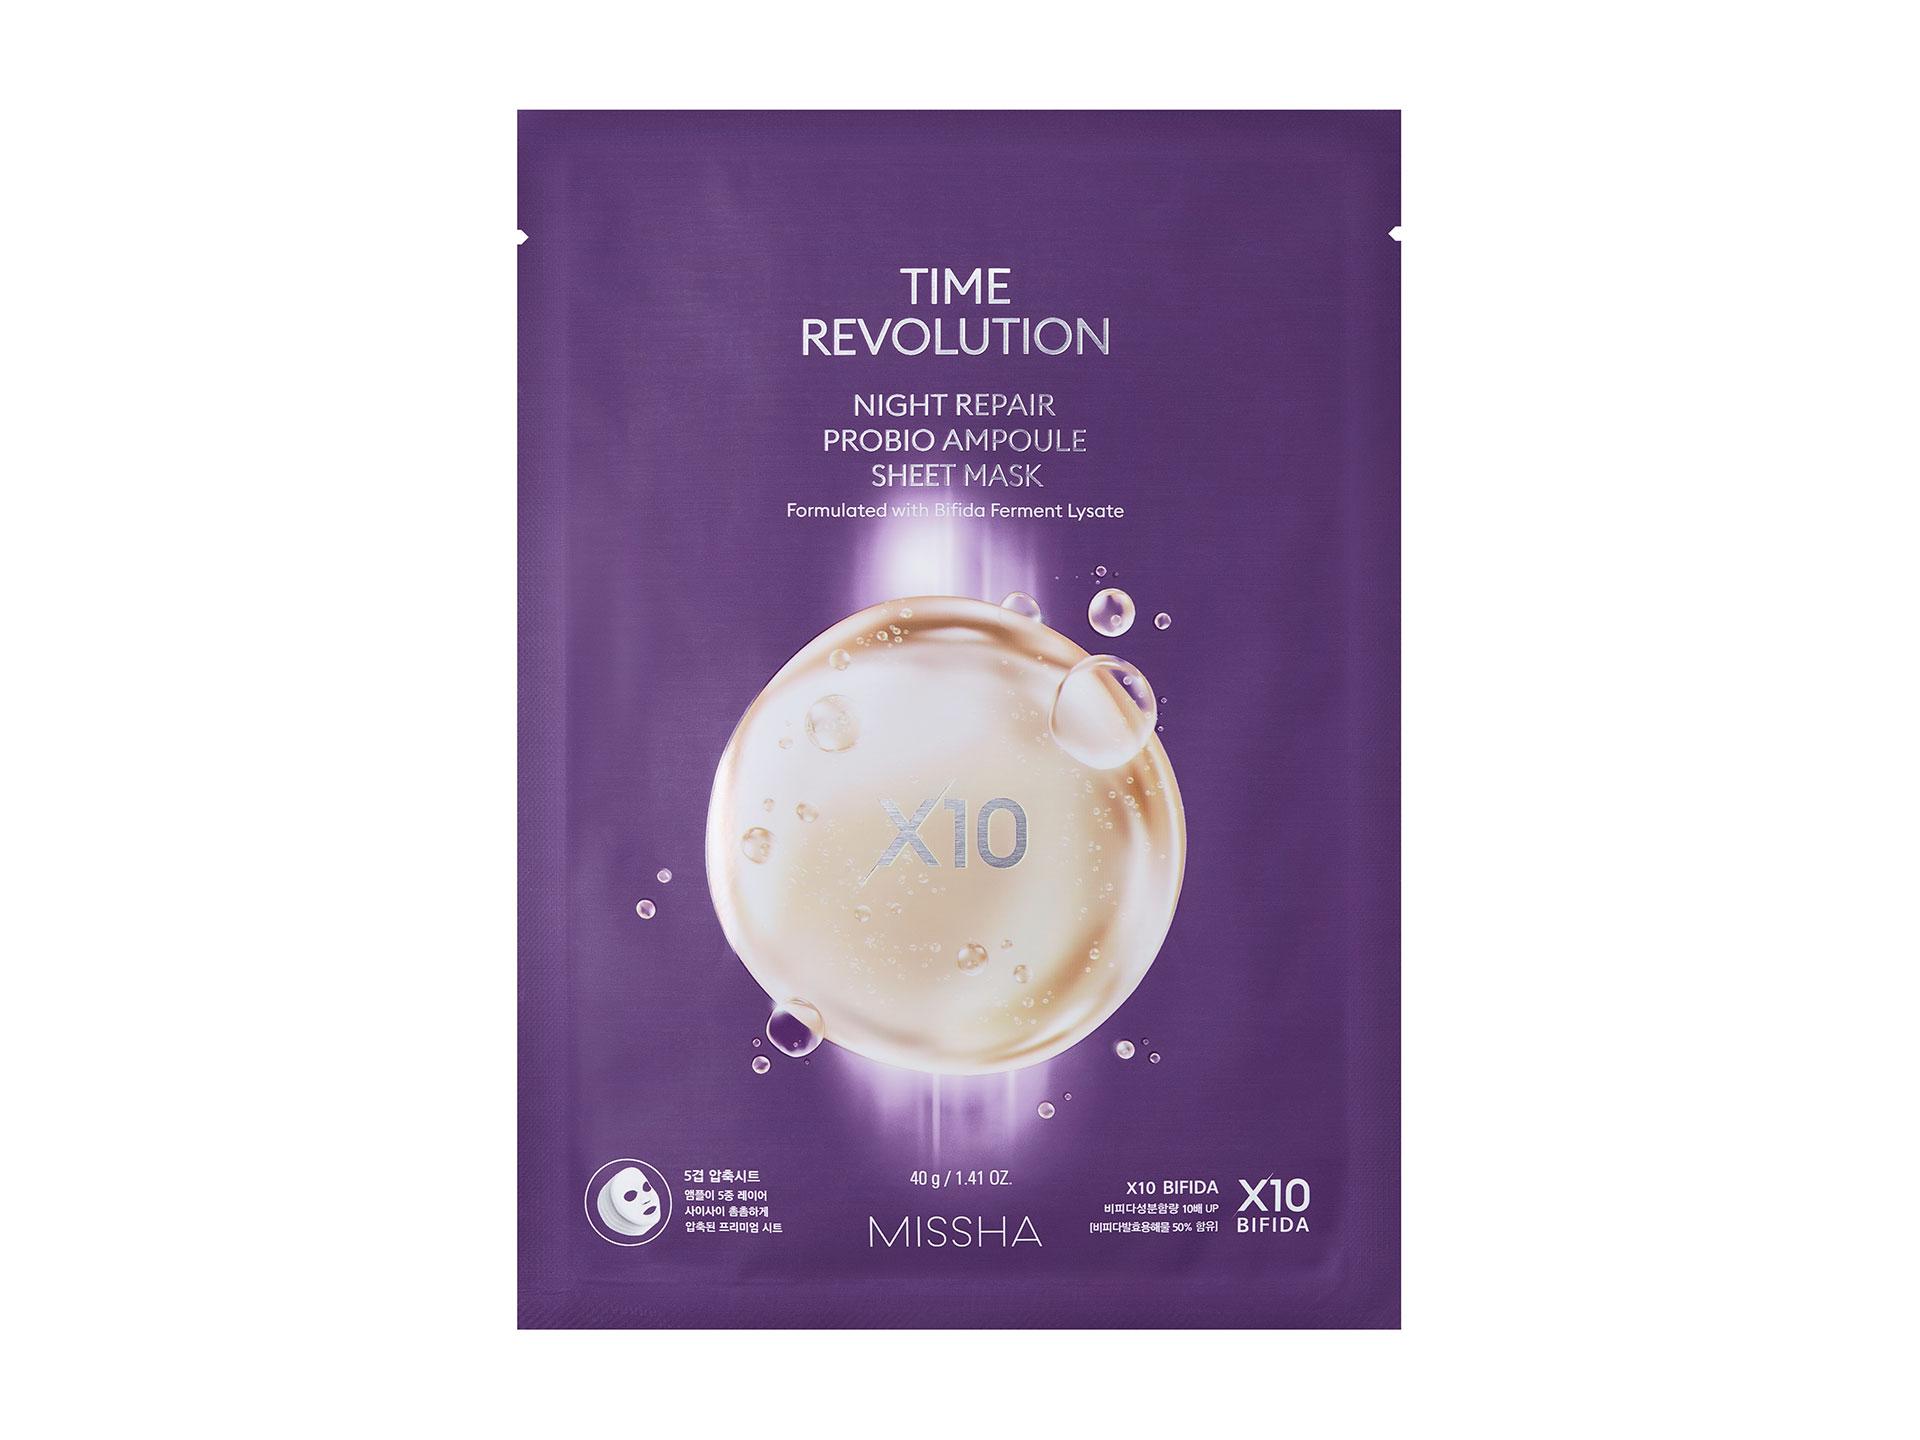 MISSHA - Time Revolution Night Repair Probio Ampoule Sheet Mask - Ujędrniająca maska z formułą anti-aging